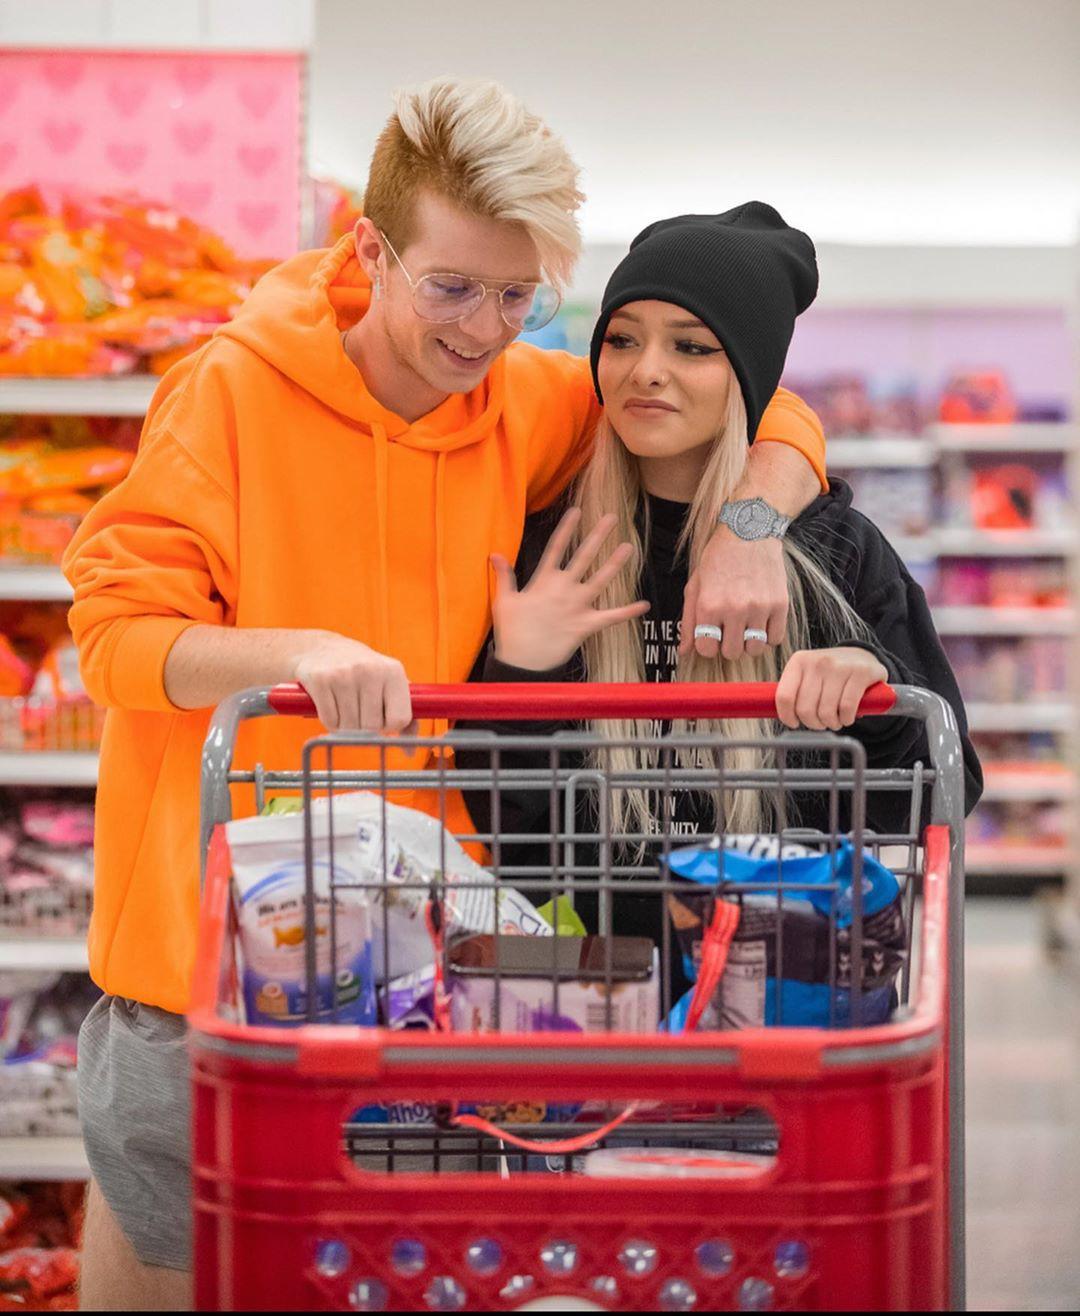 Zoe Laverne having fun, grocery store, shopping cart